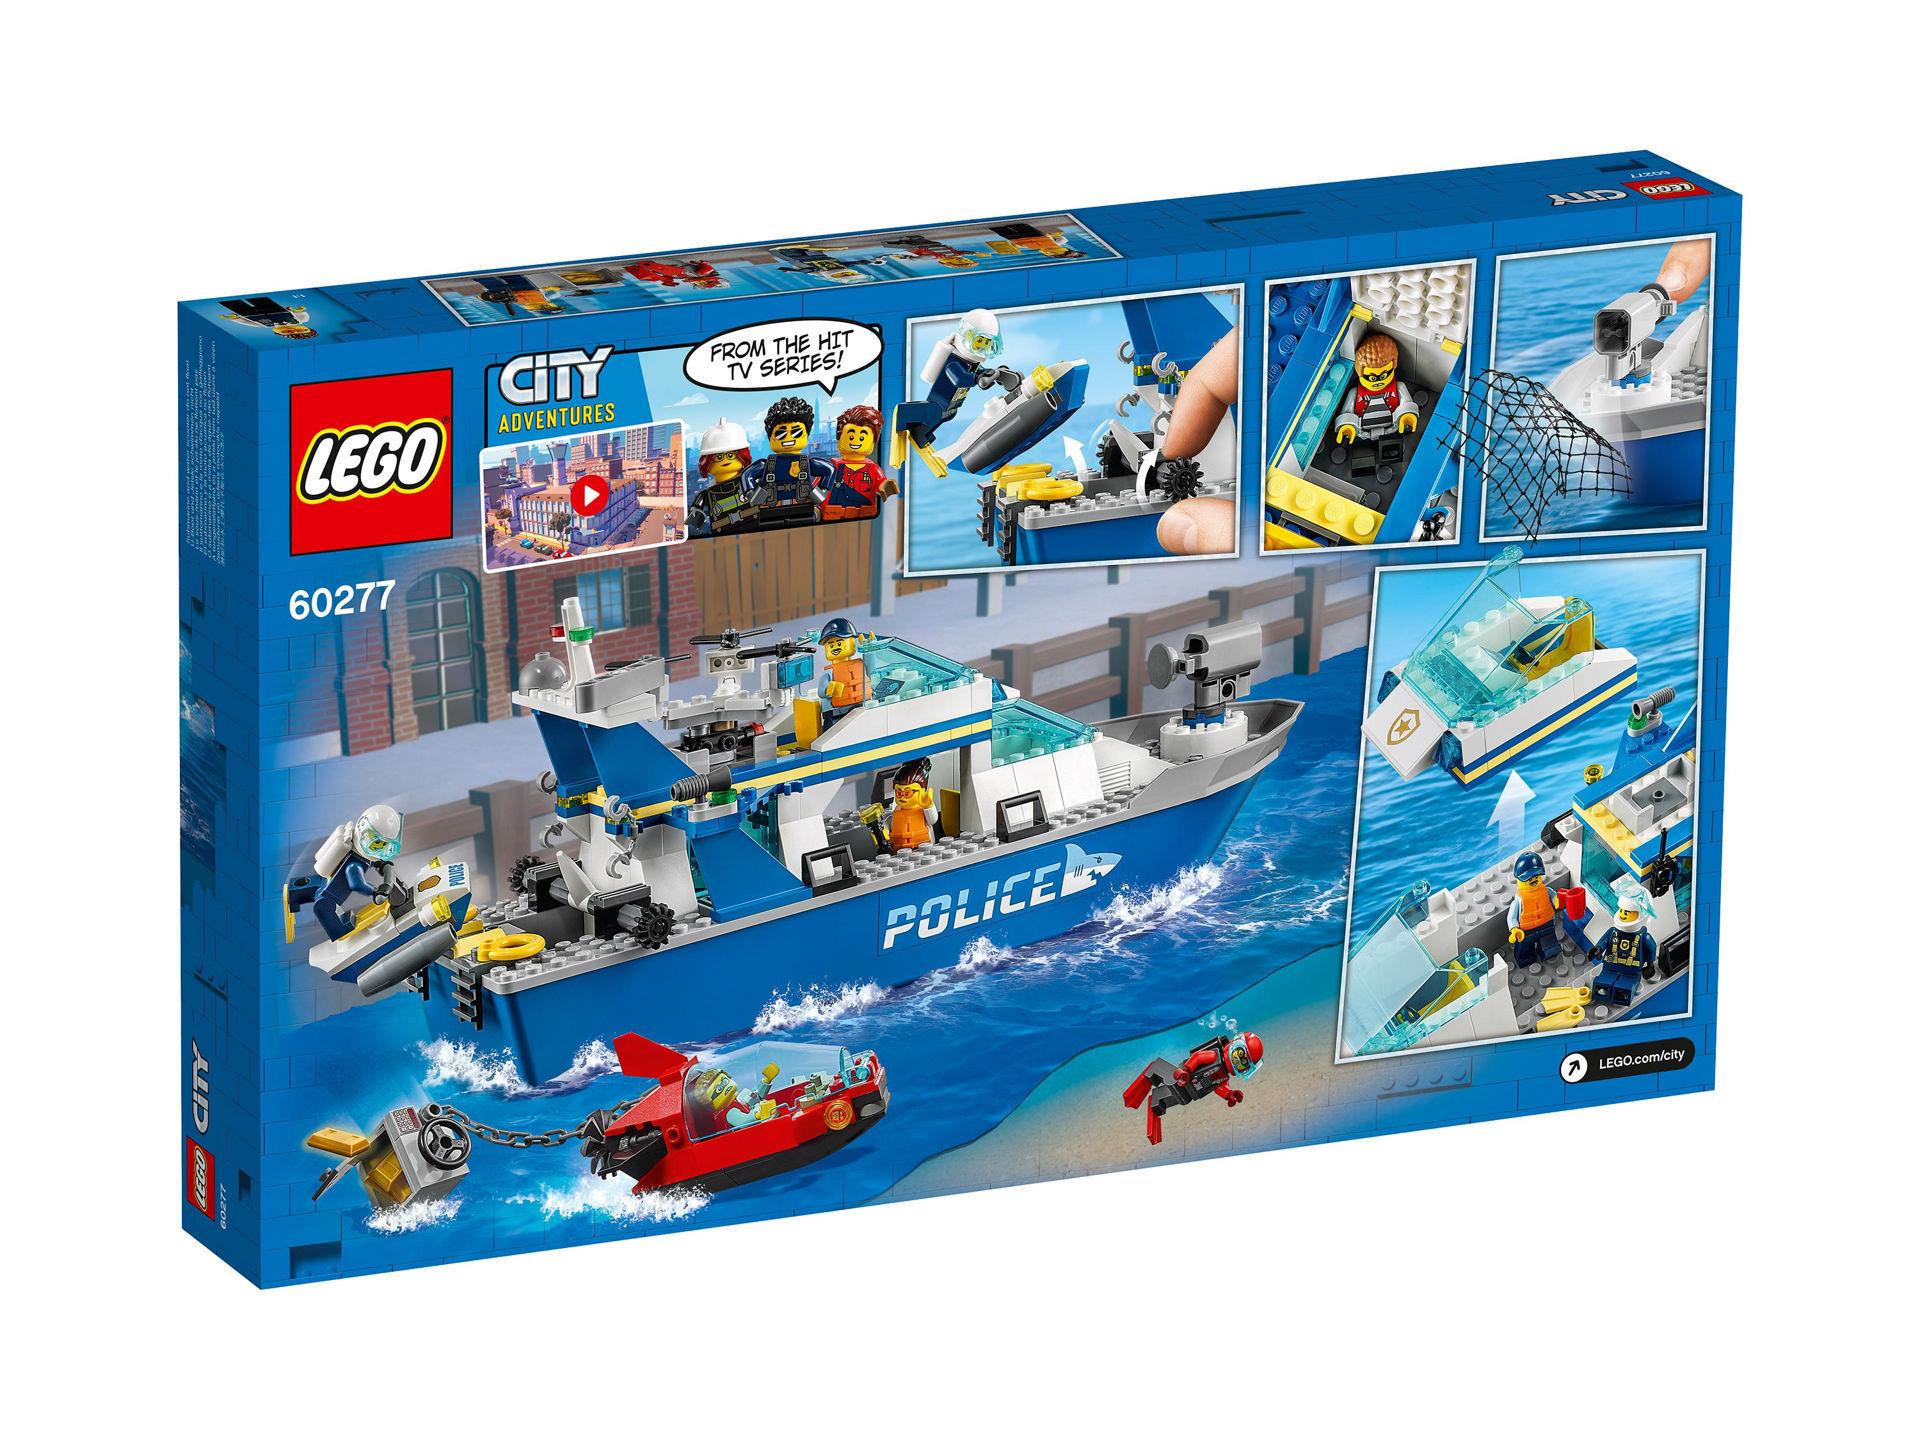 Lego City - Police Patrol Boat 60277